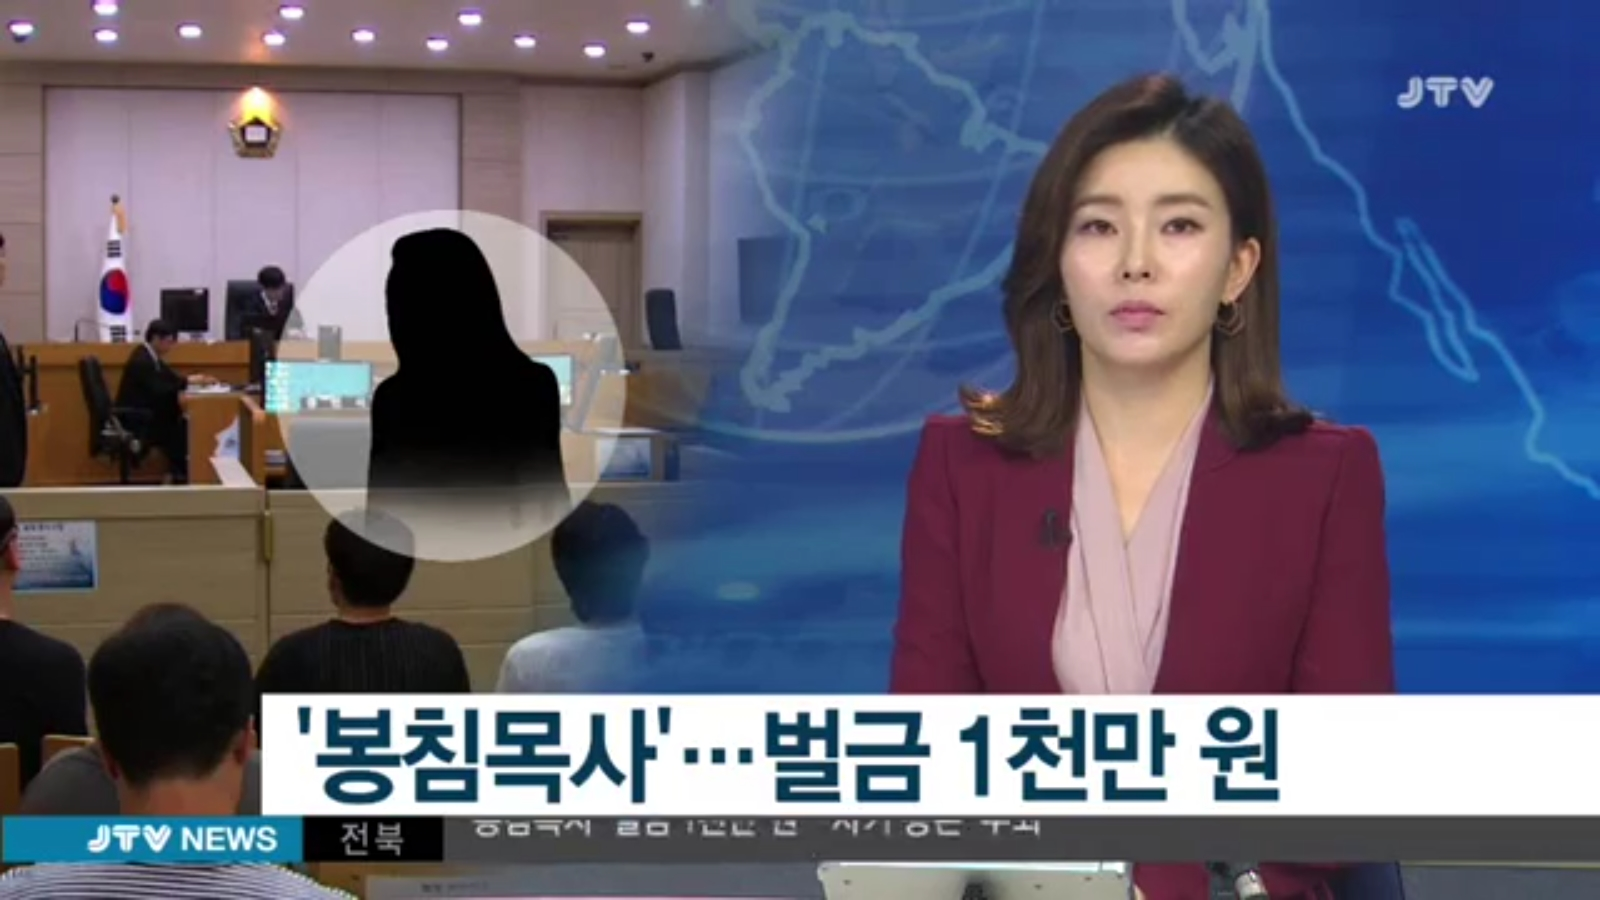 [18.7.20 JTV] 전주 봉침게이트, 검찰은 기소축소... 법원은 재판거래...1.jpg